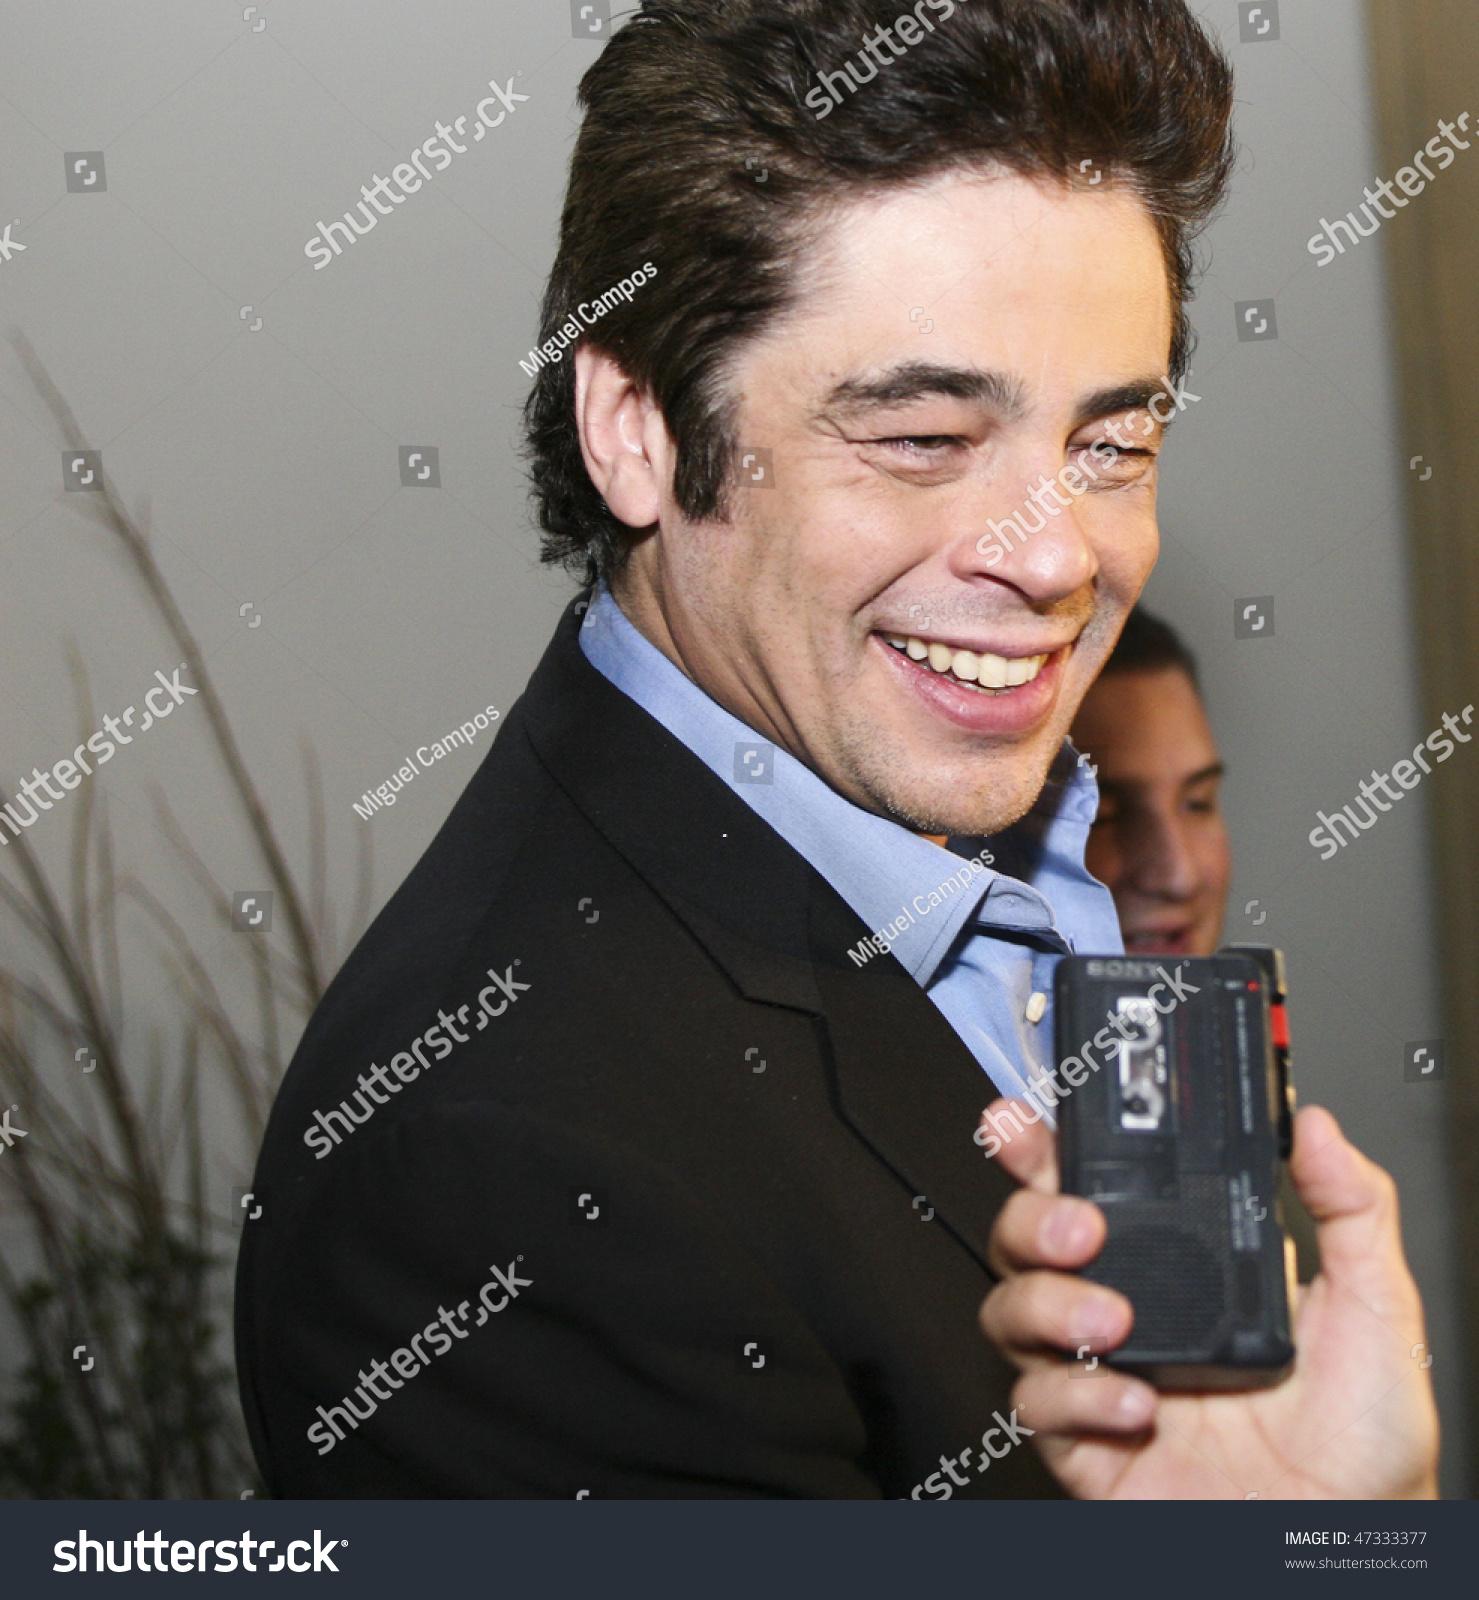 Mexico City February 08 Actor Benicio Stock Photo Edit Now Del Press Release Toro Attends The Wolfman